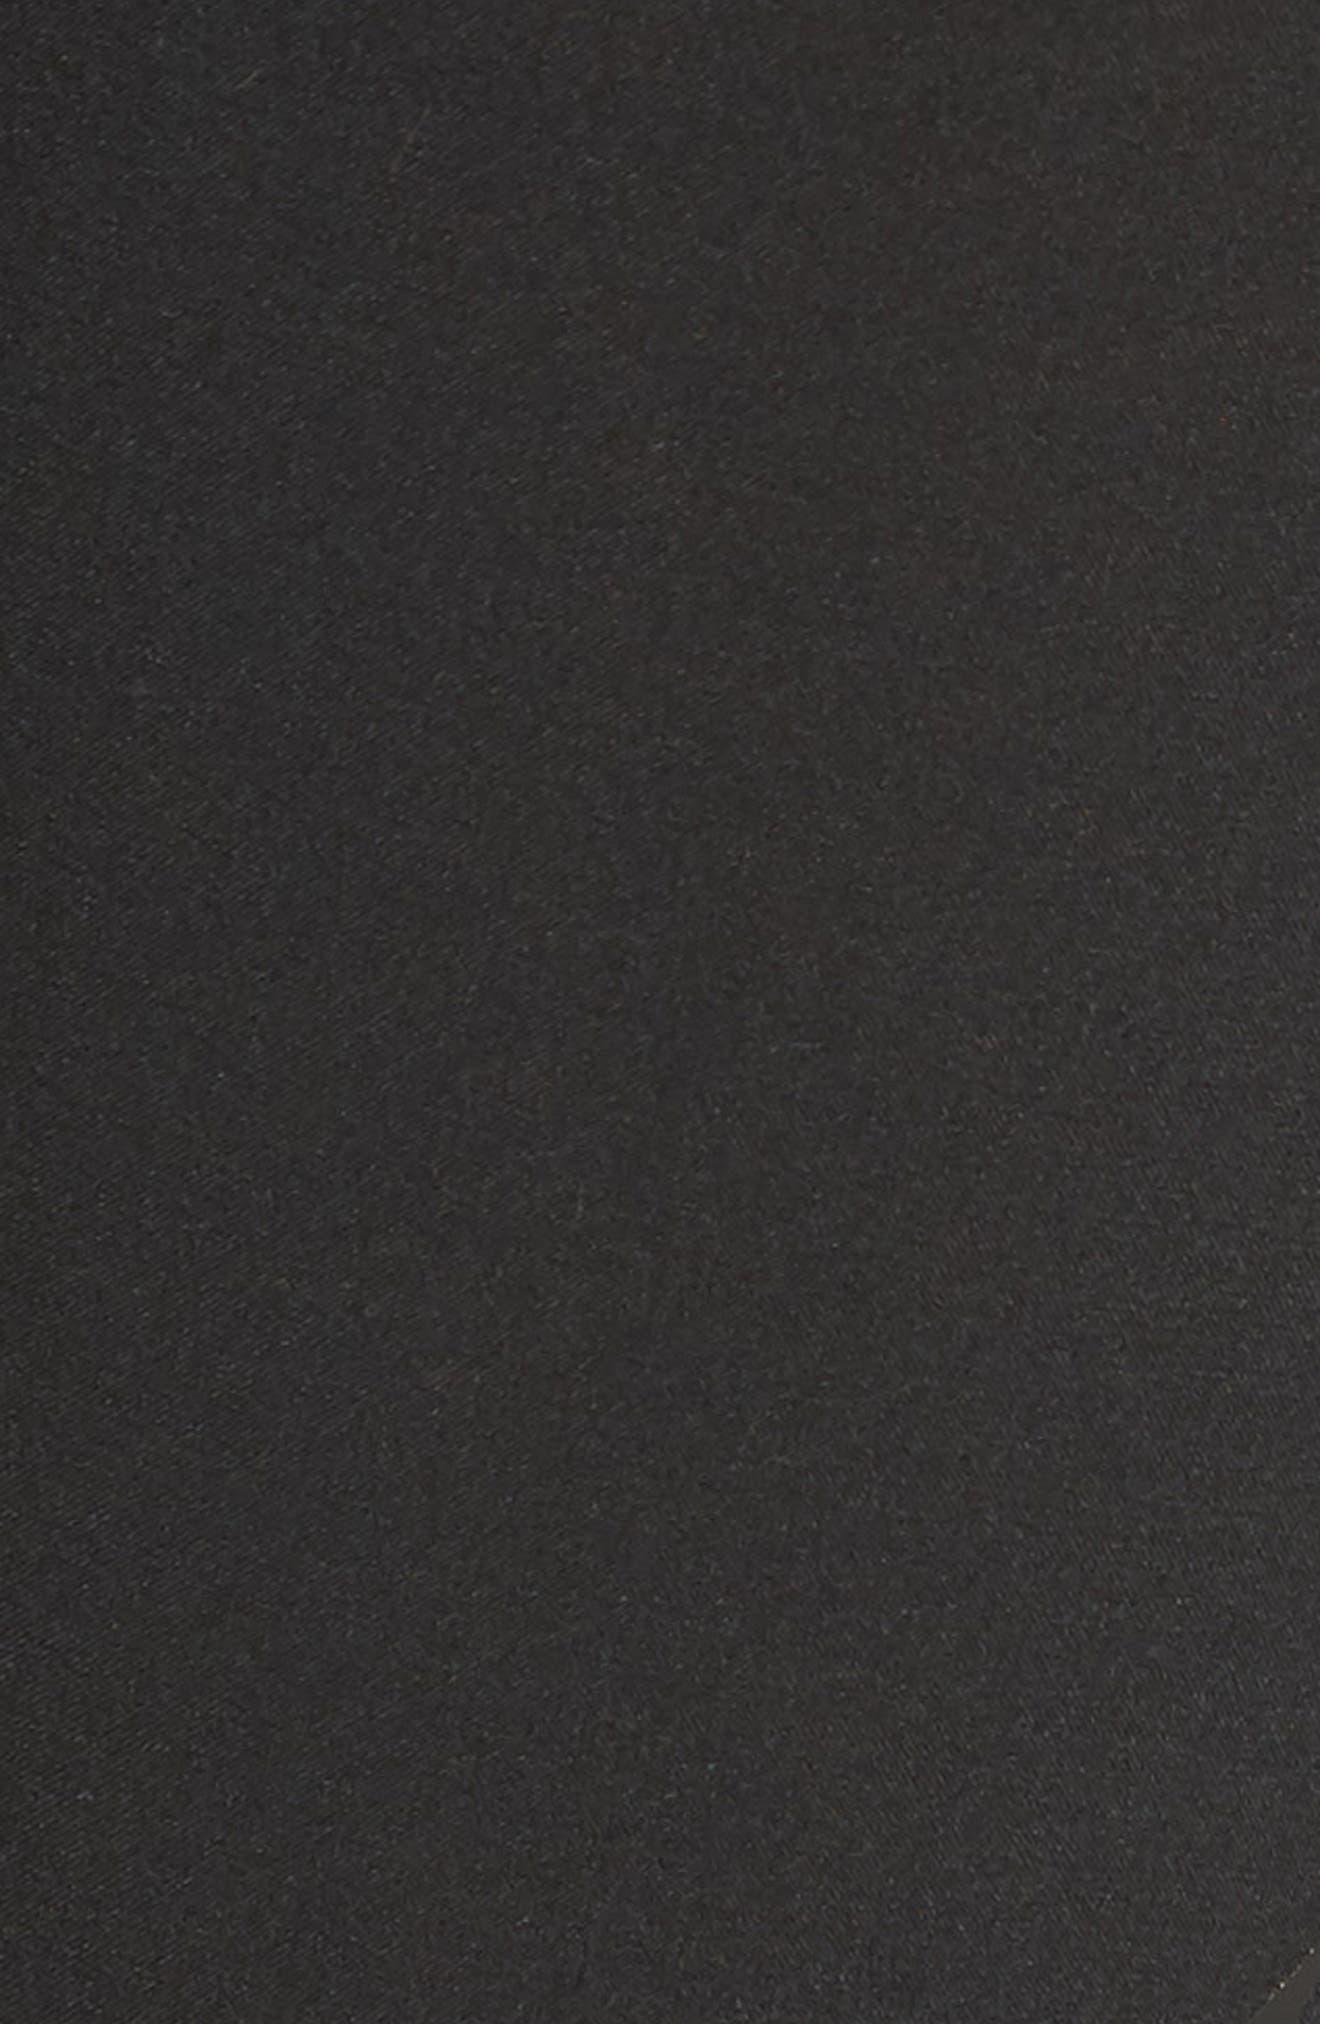 Pro Power Tights,                             Alternate thumbnail 5, color,                             BLACK/ DARK GREY